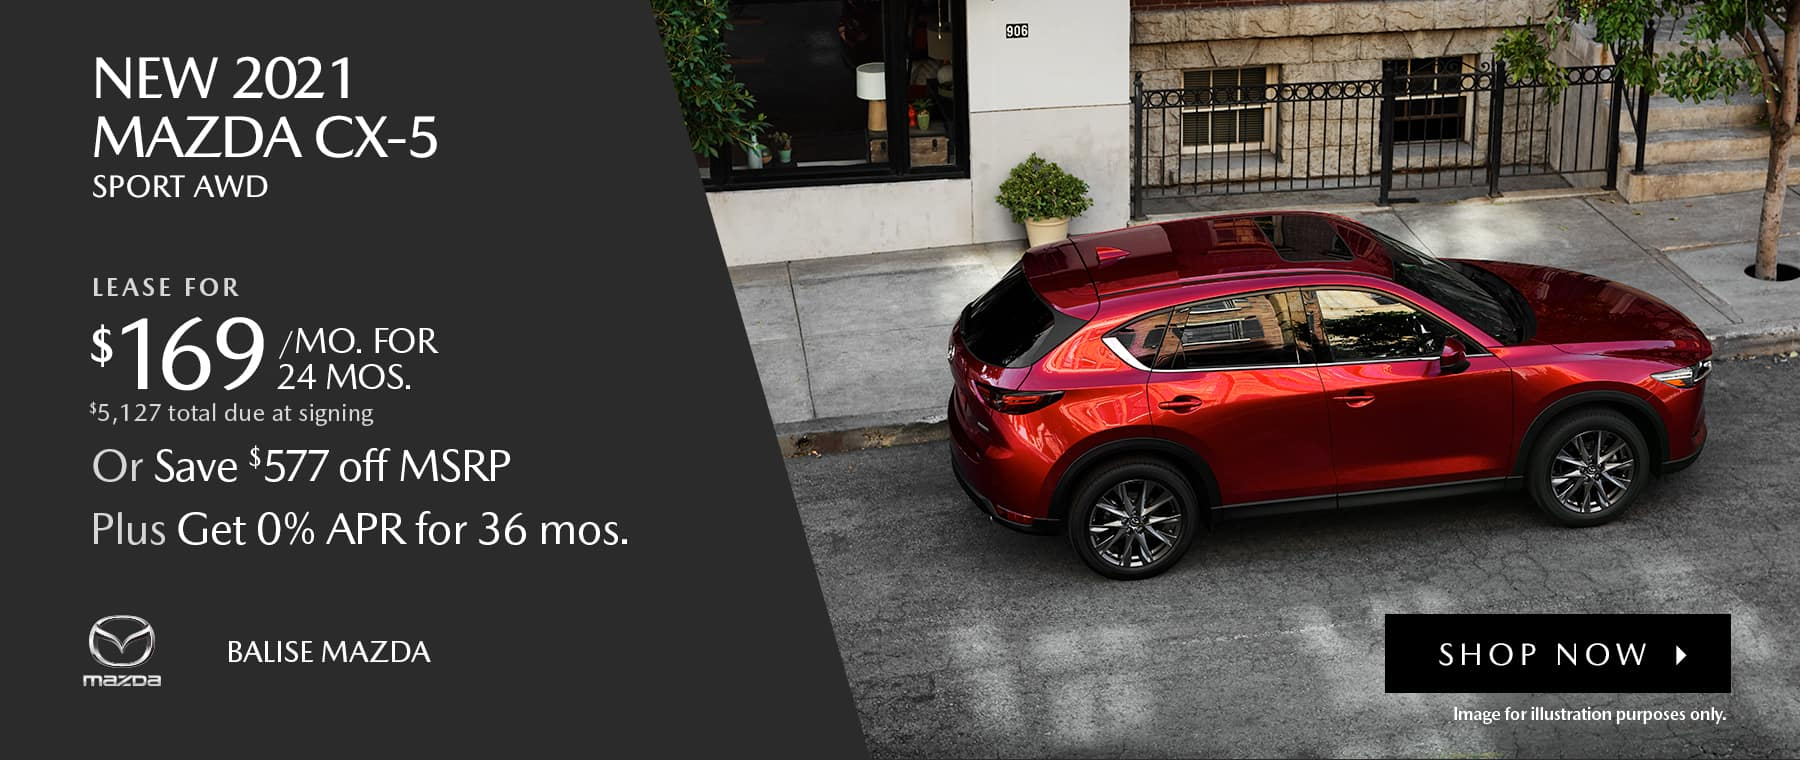 BMAZ-HomePageBanner-1800x760_New 2021_Mazda CX-5 SPORT AWD_06'21